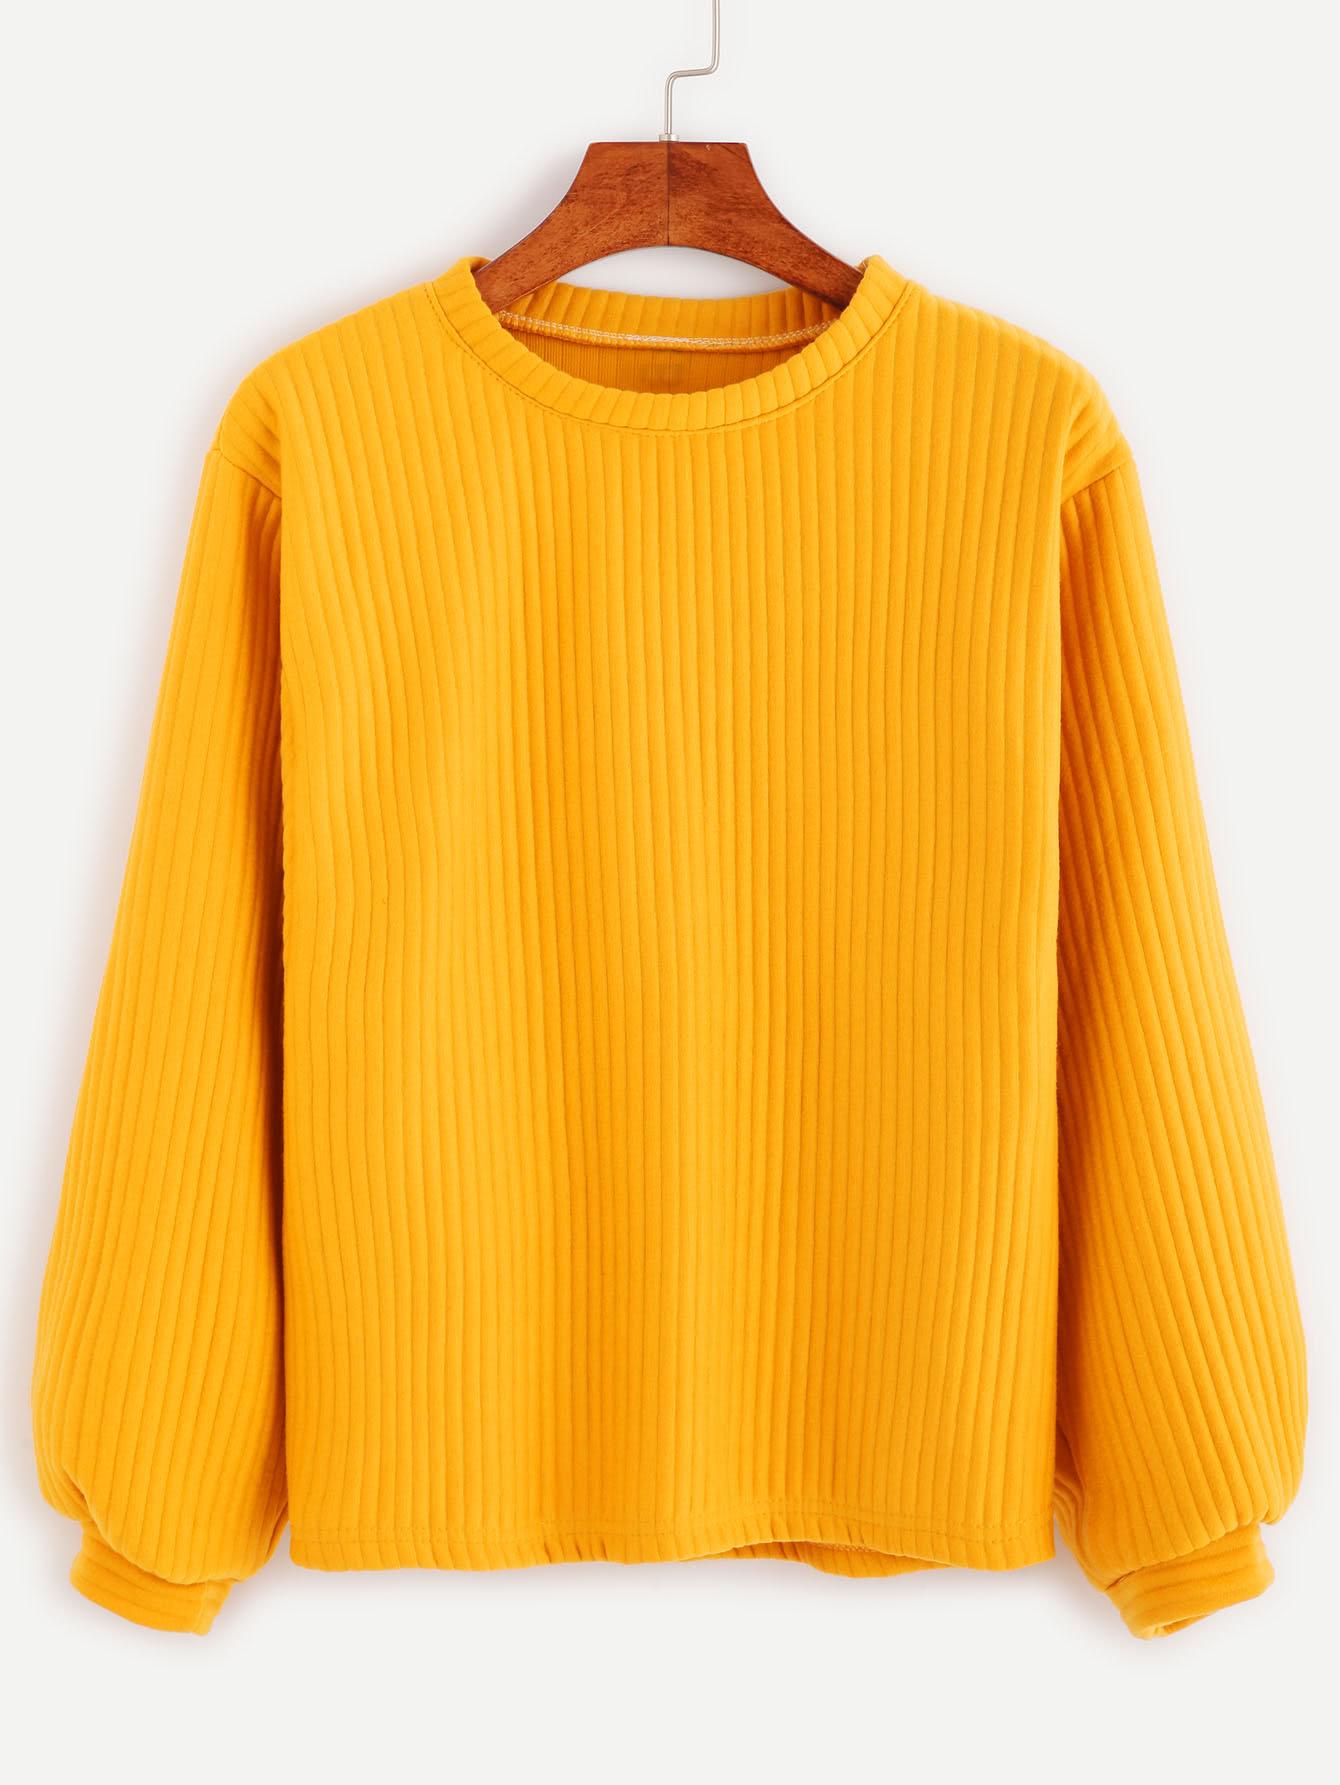 Ribbed Knit Sweatshirt sweatshirt161007104